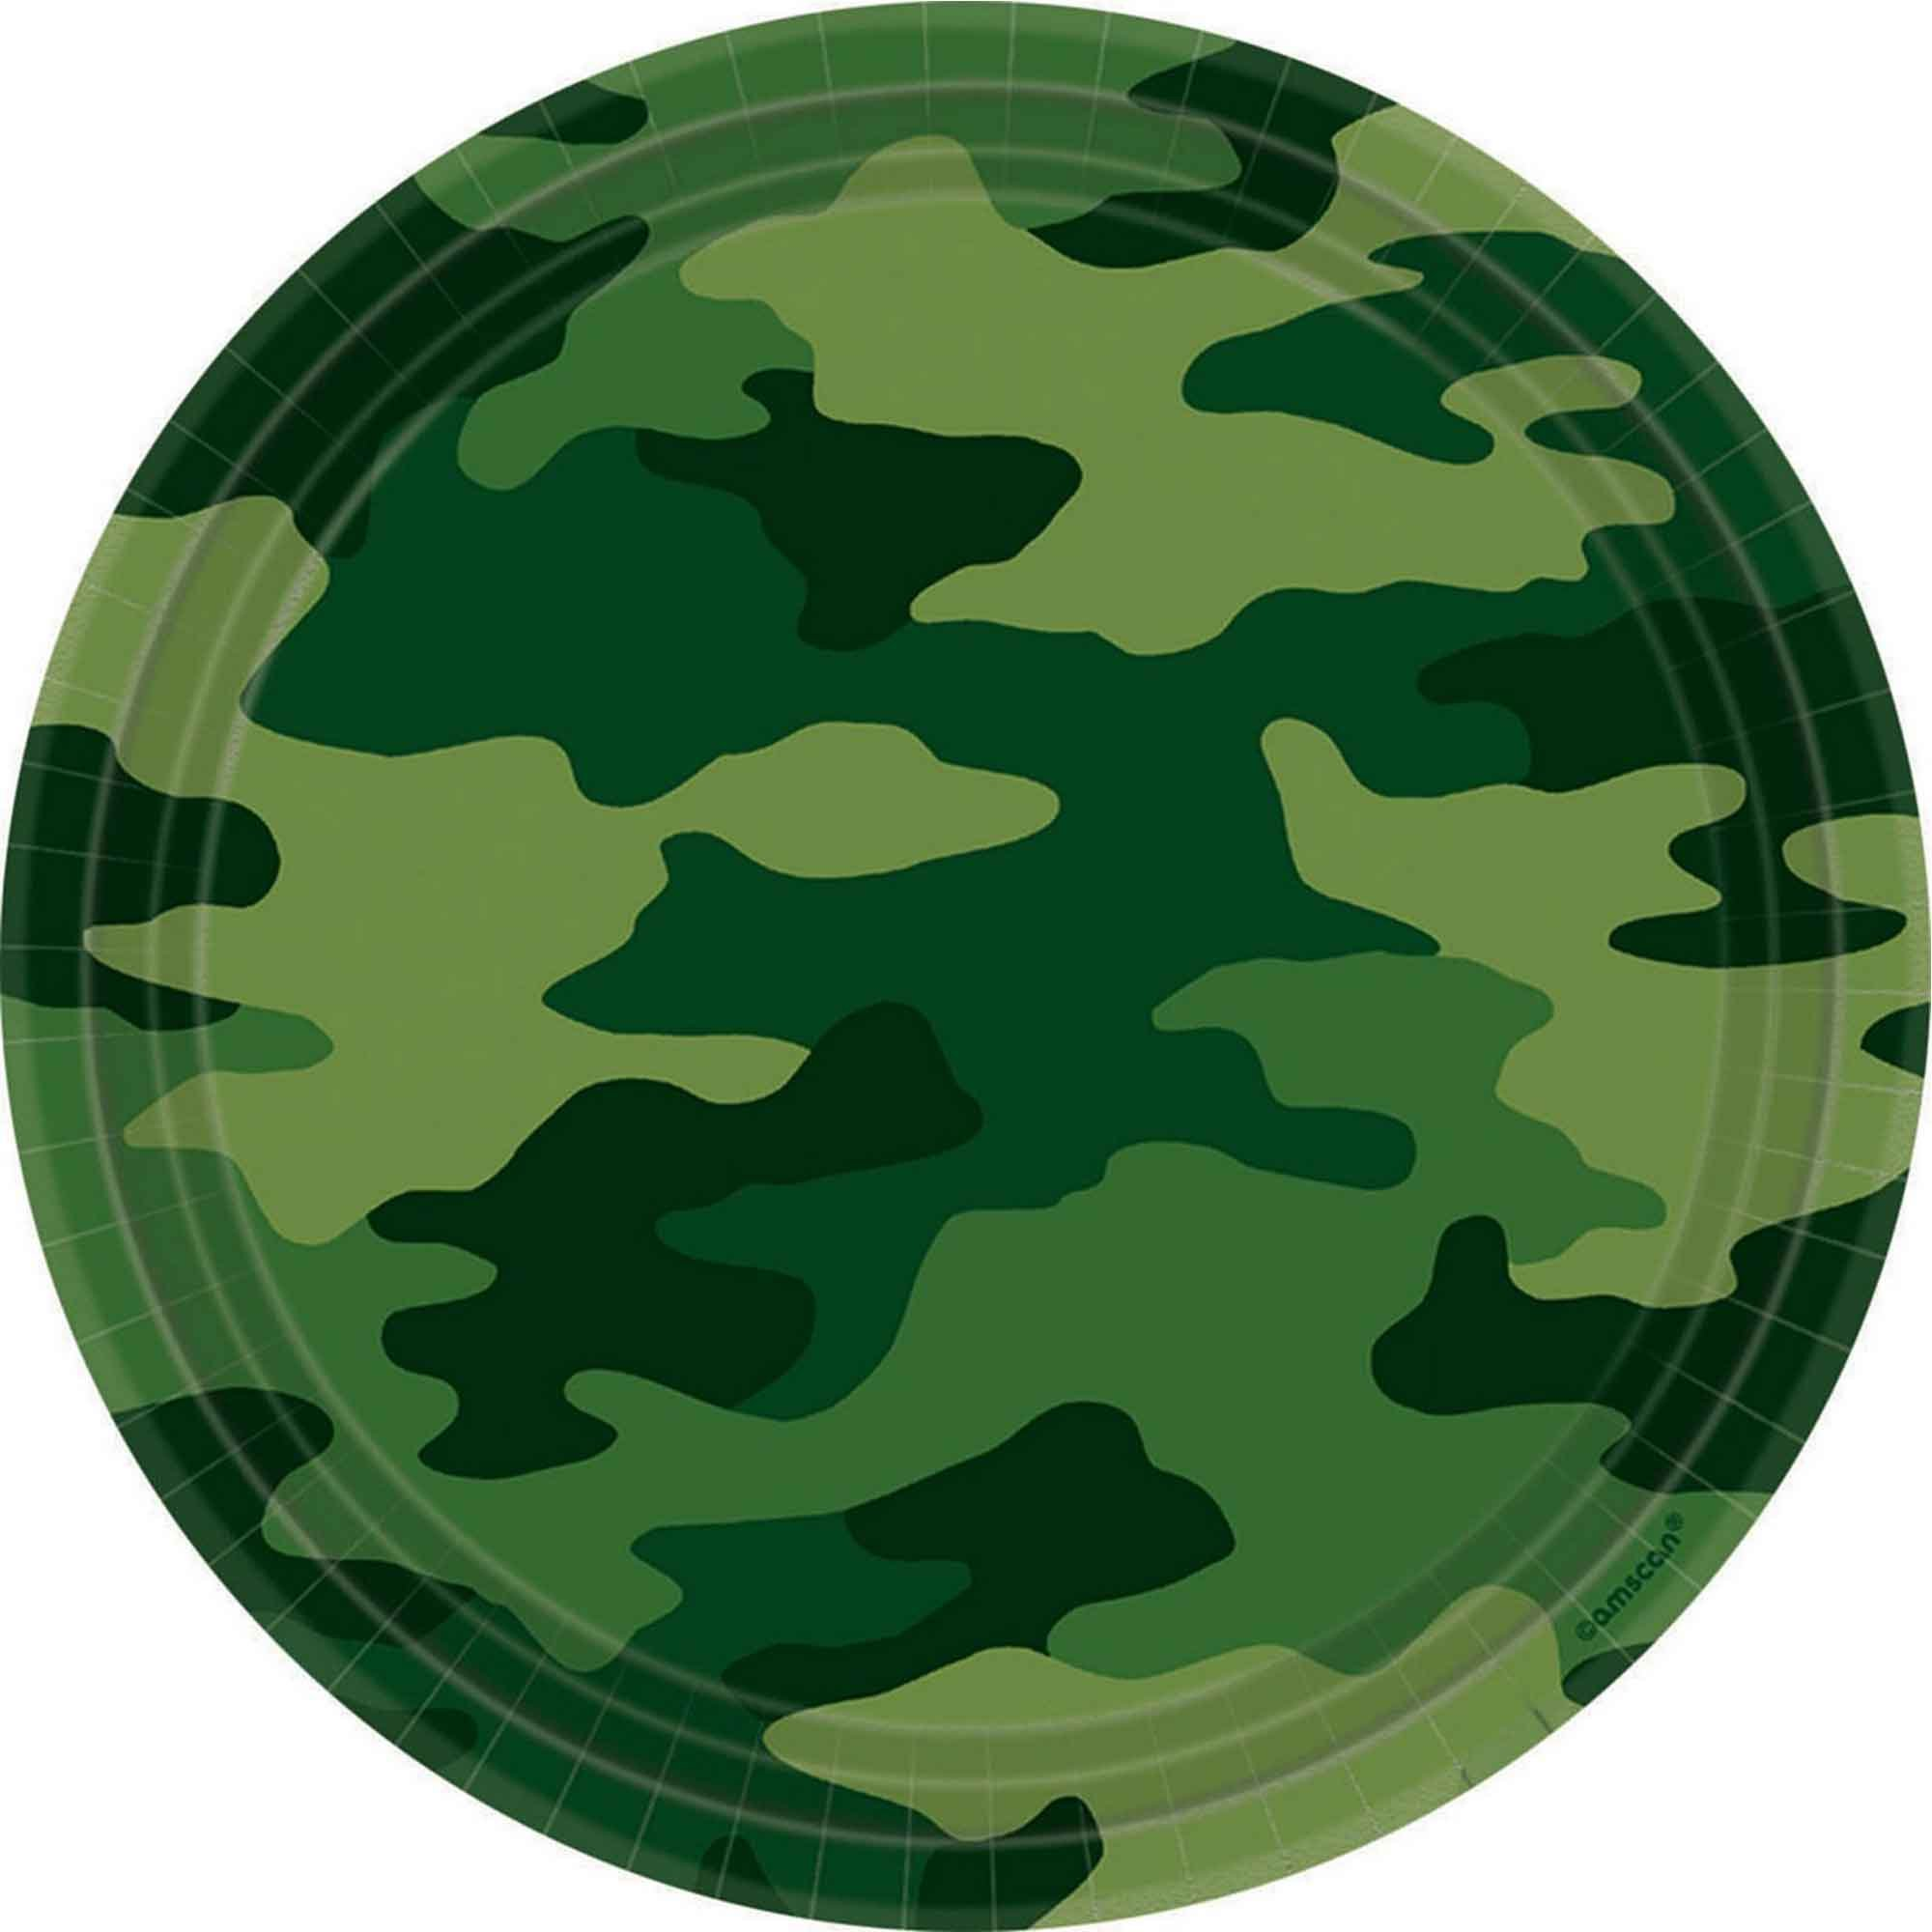 Camouflage 23cm Round Plates